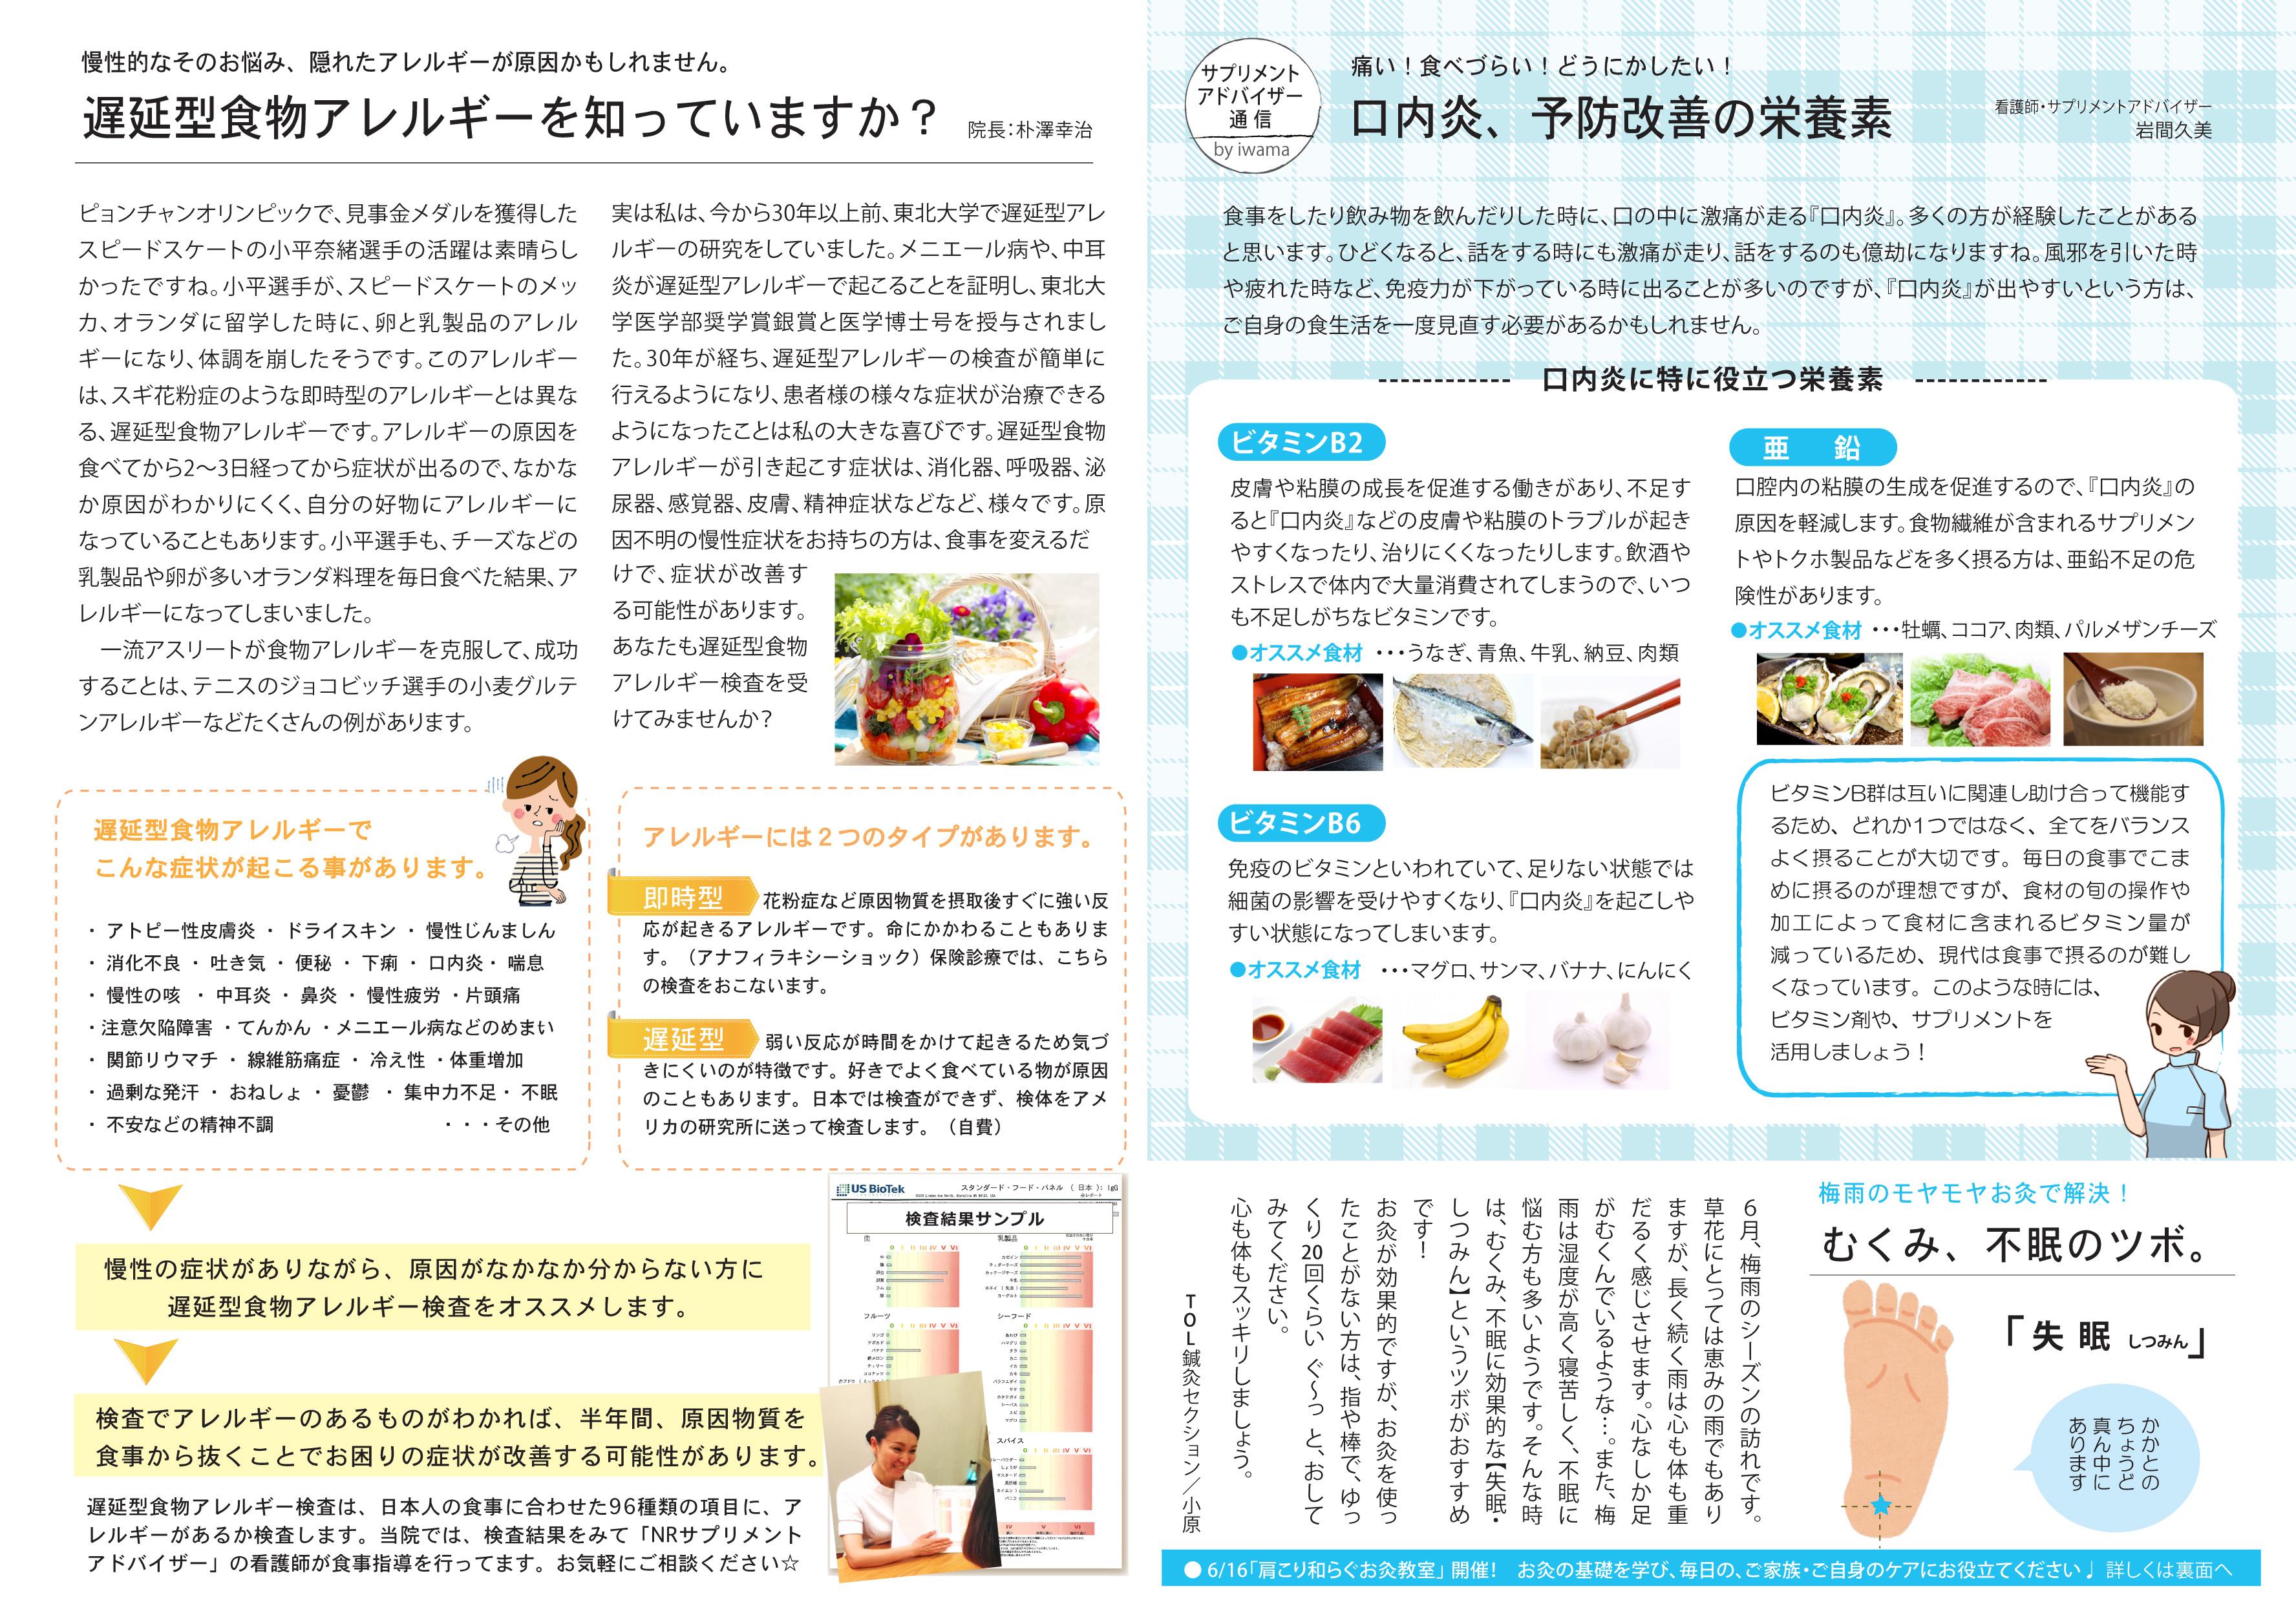 http://hozawa.jp/news/news_img/newsletter_ura301.jpg